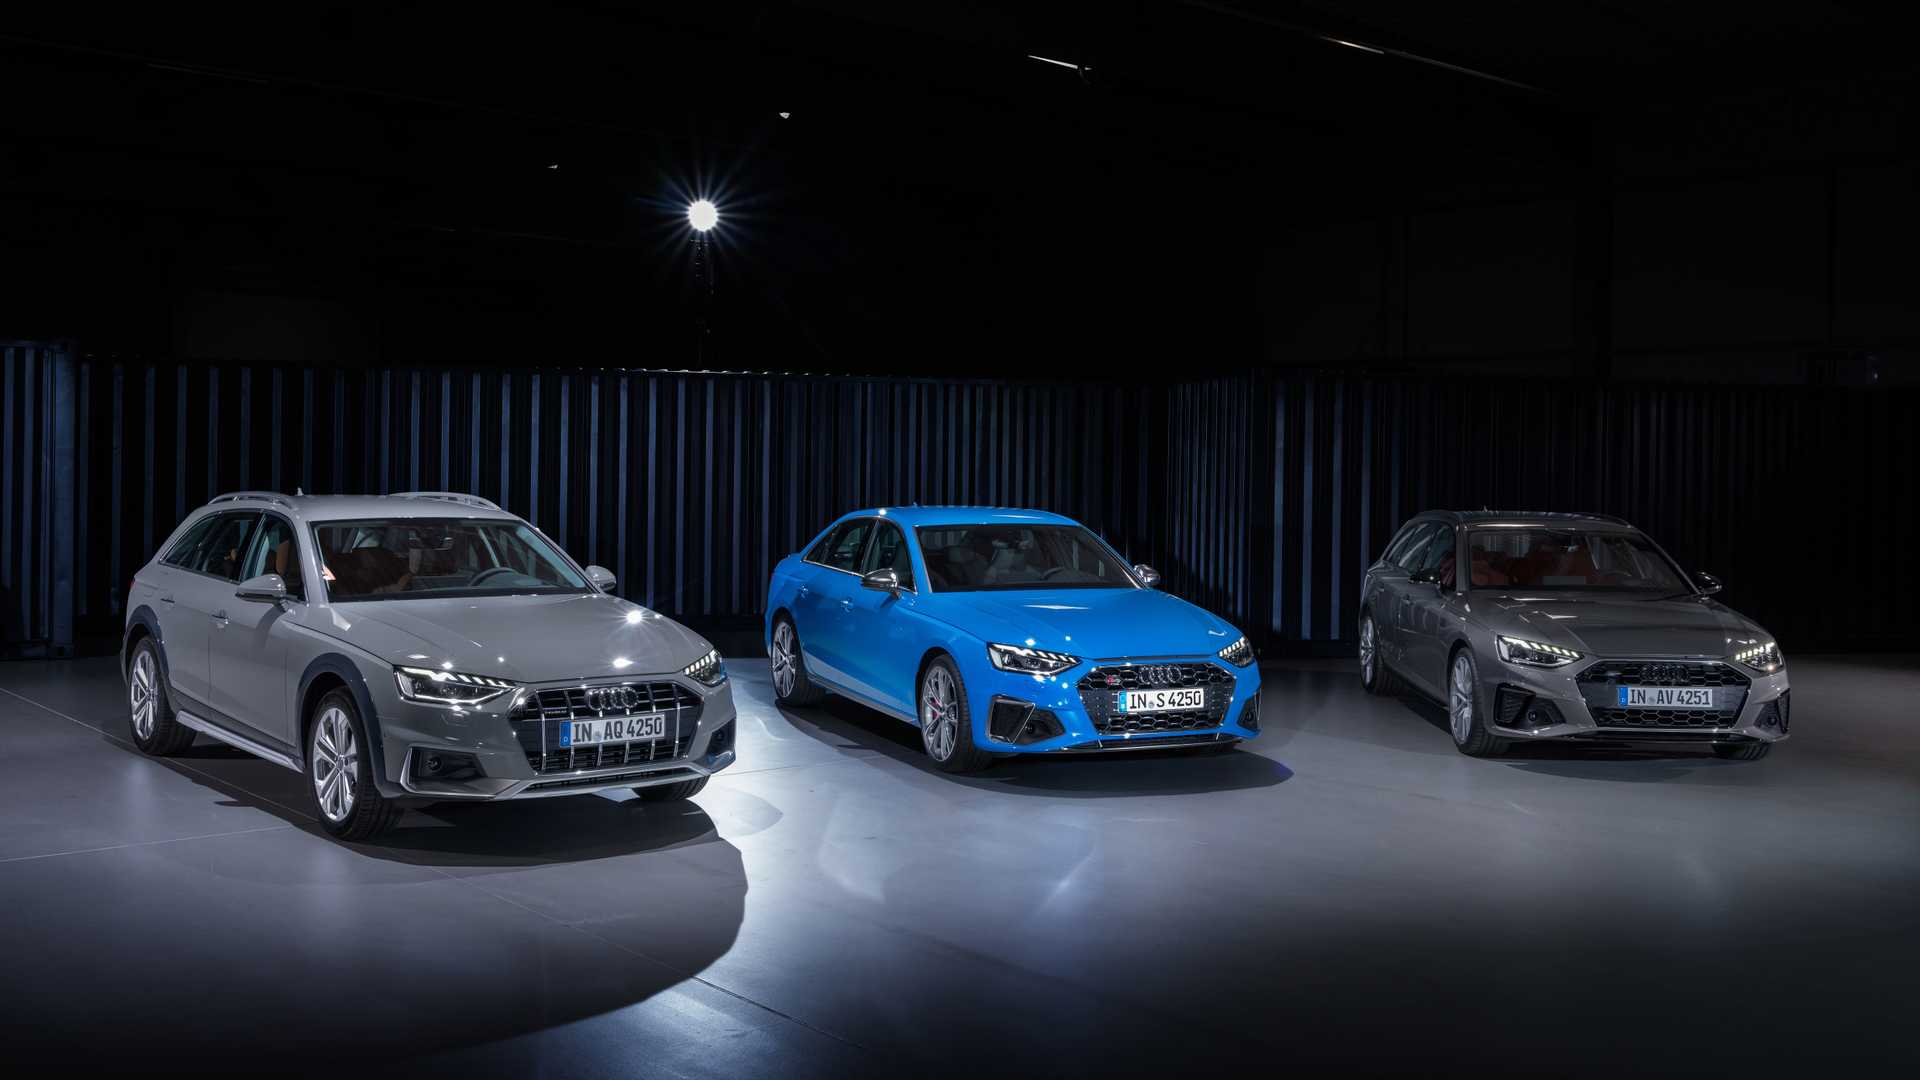 Predstavljen je restilizovani Audi A4 (GALERIJA)